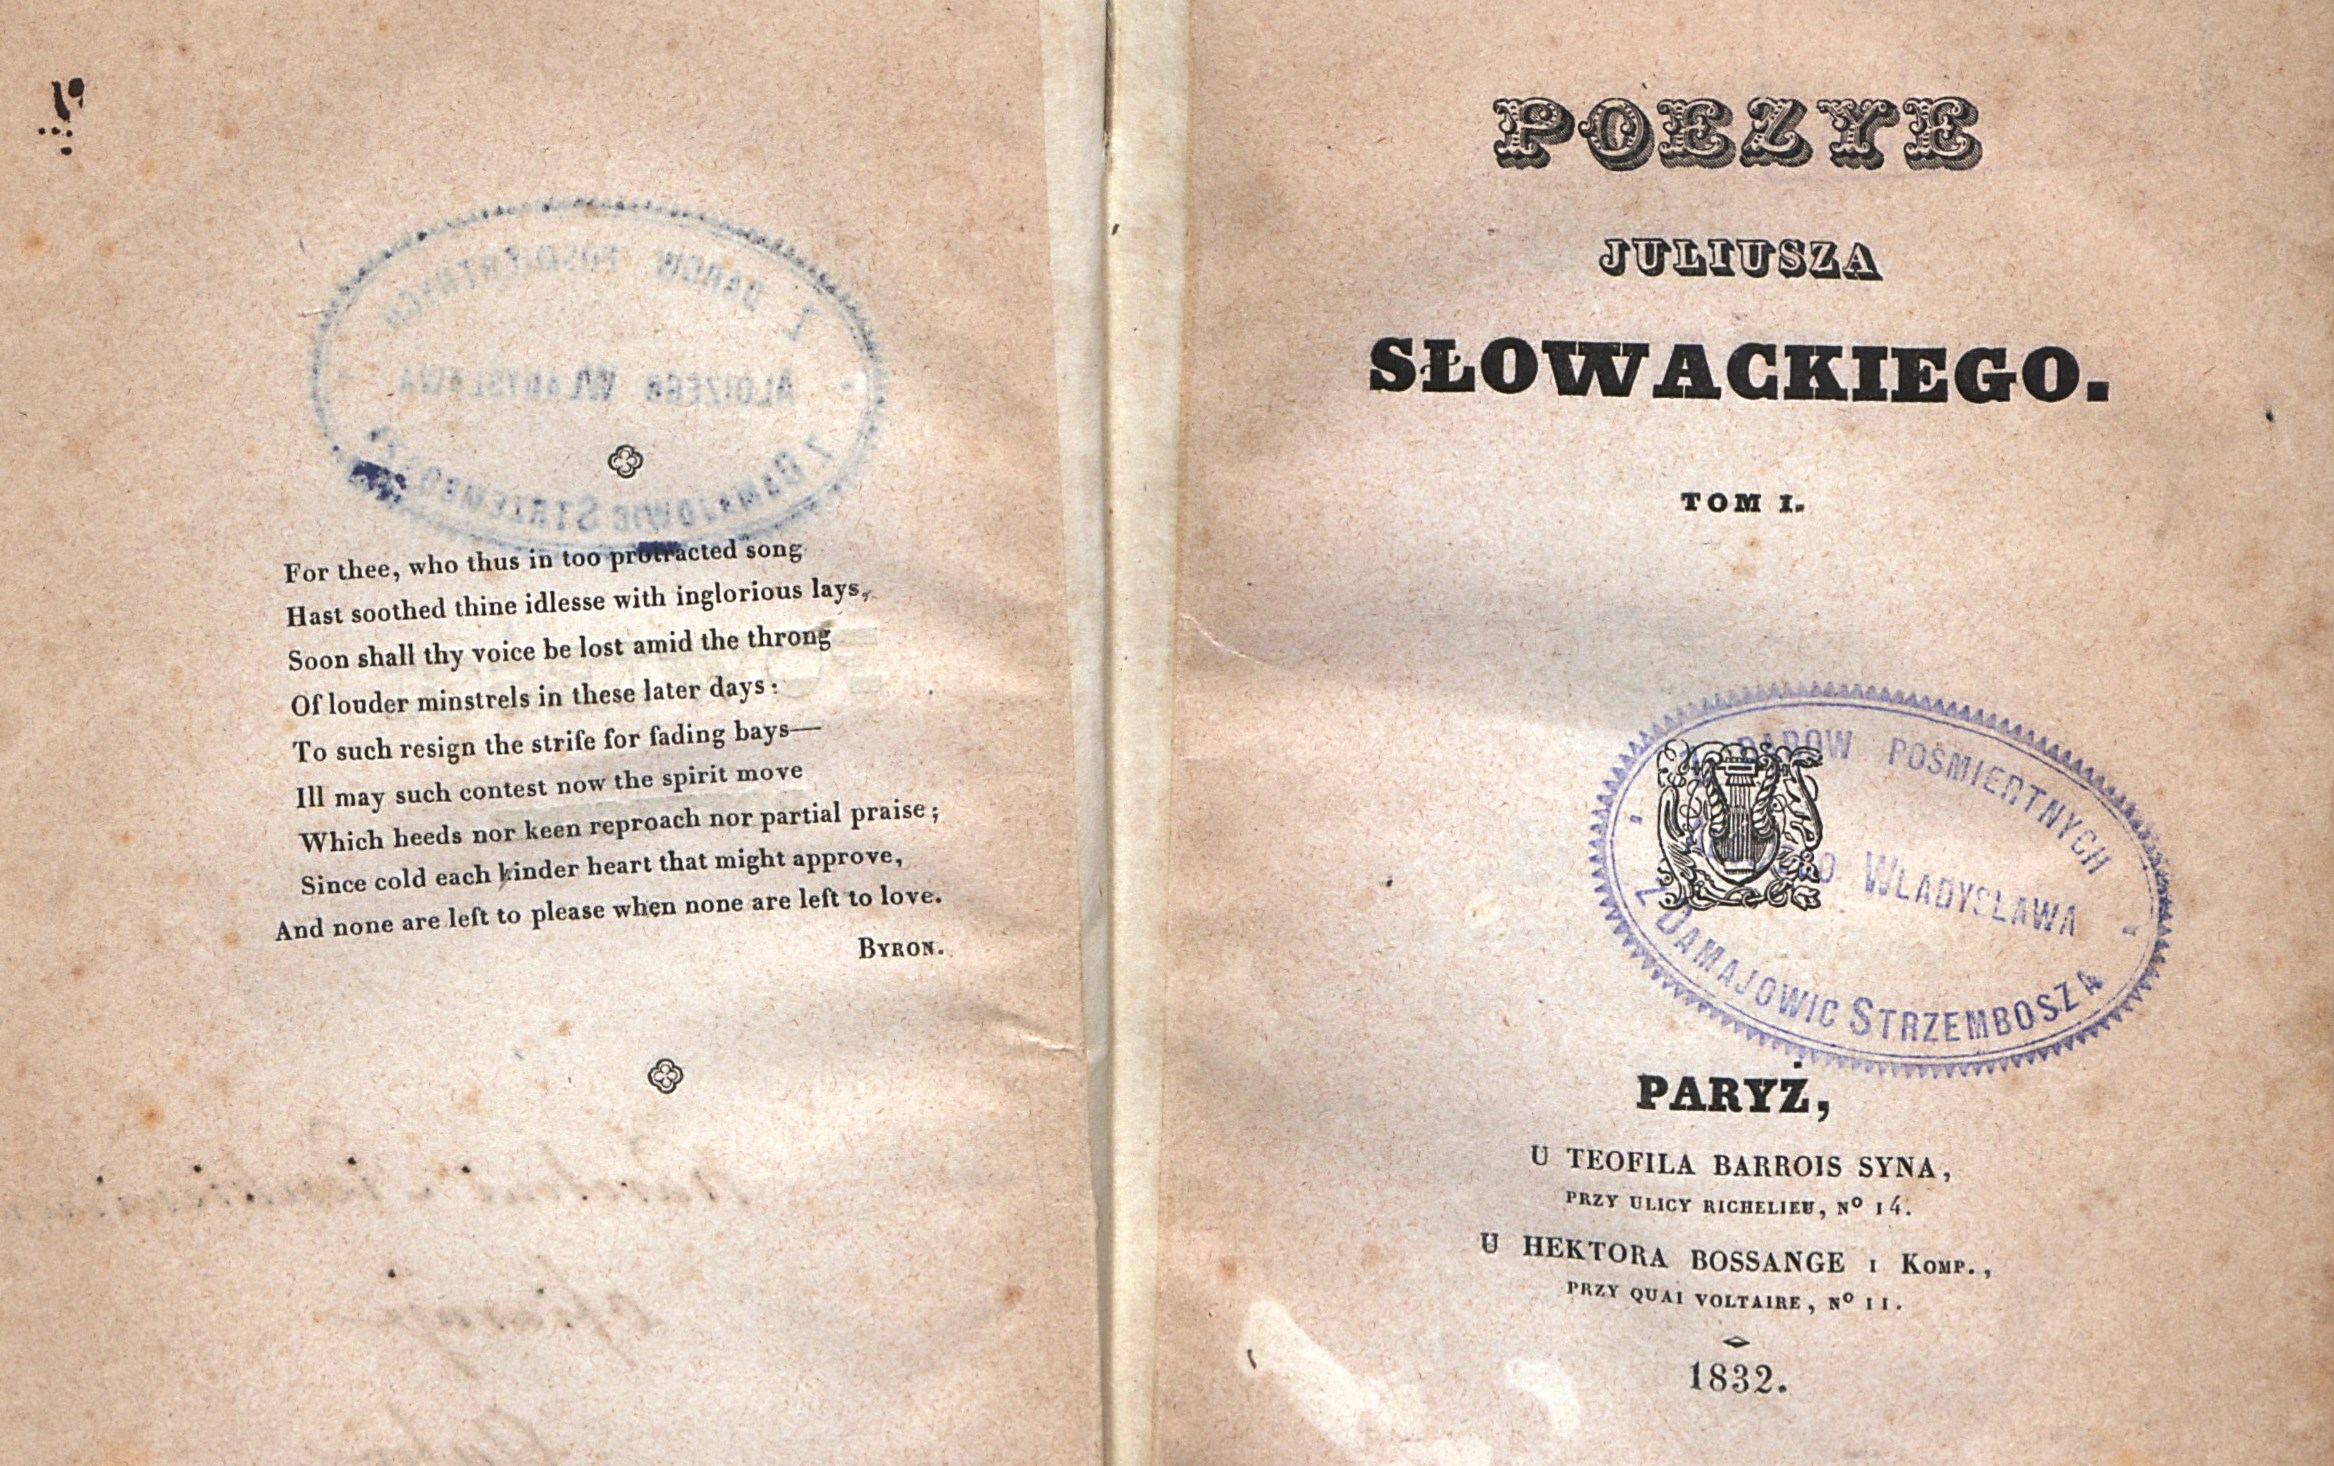 Juliusz Słowacki H Leliwa 1809 1849 Poeta Dramaturg